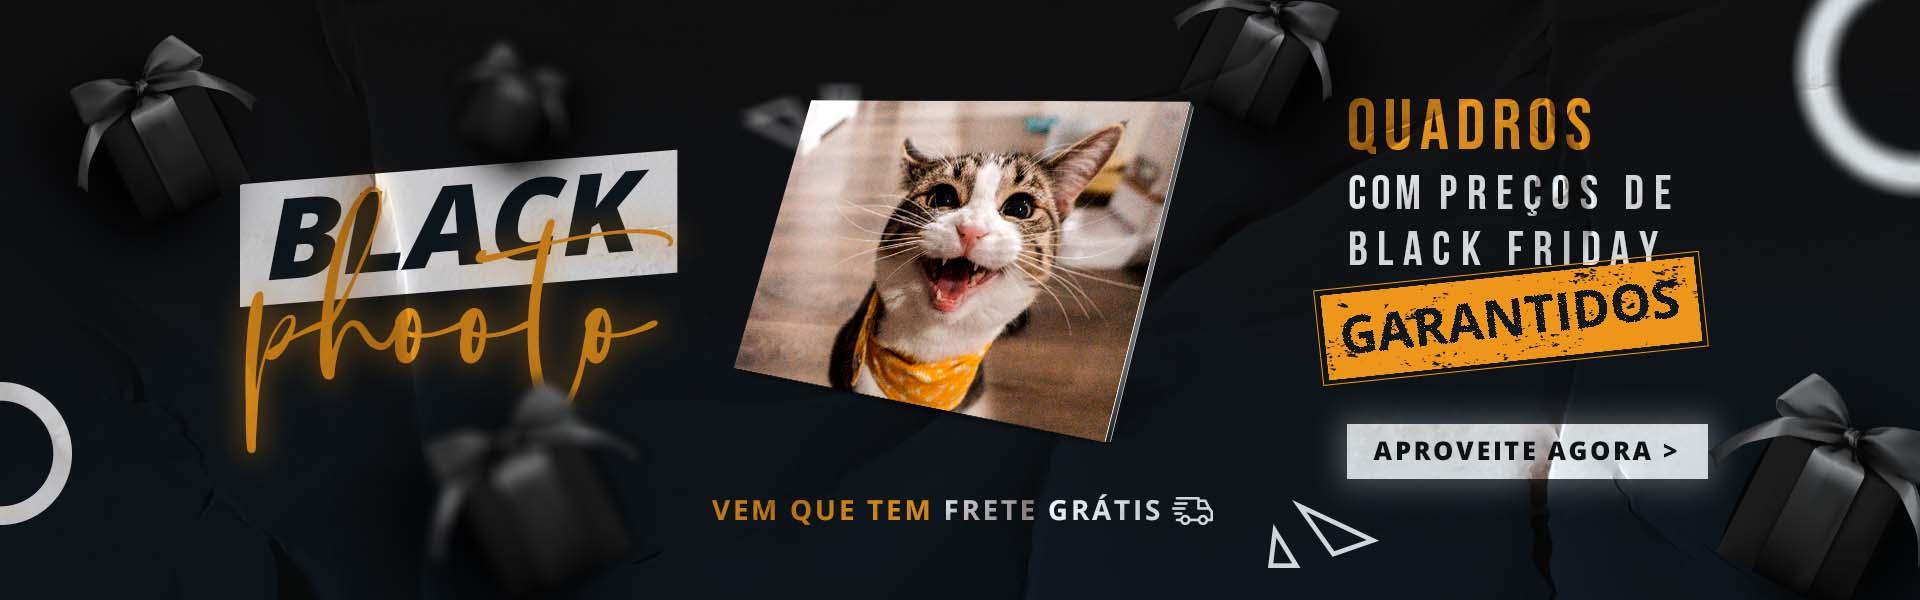 Fotolivros - Phooto Brasil